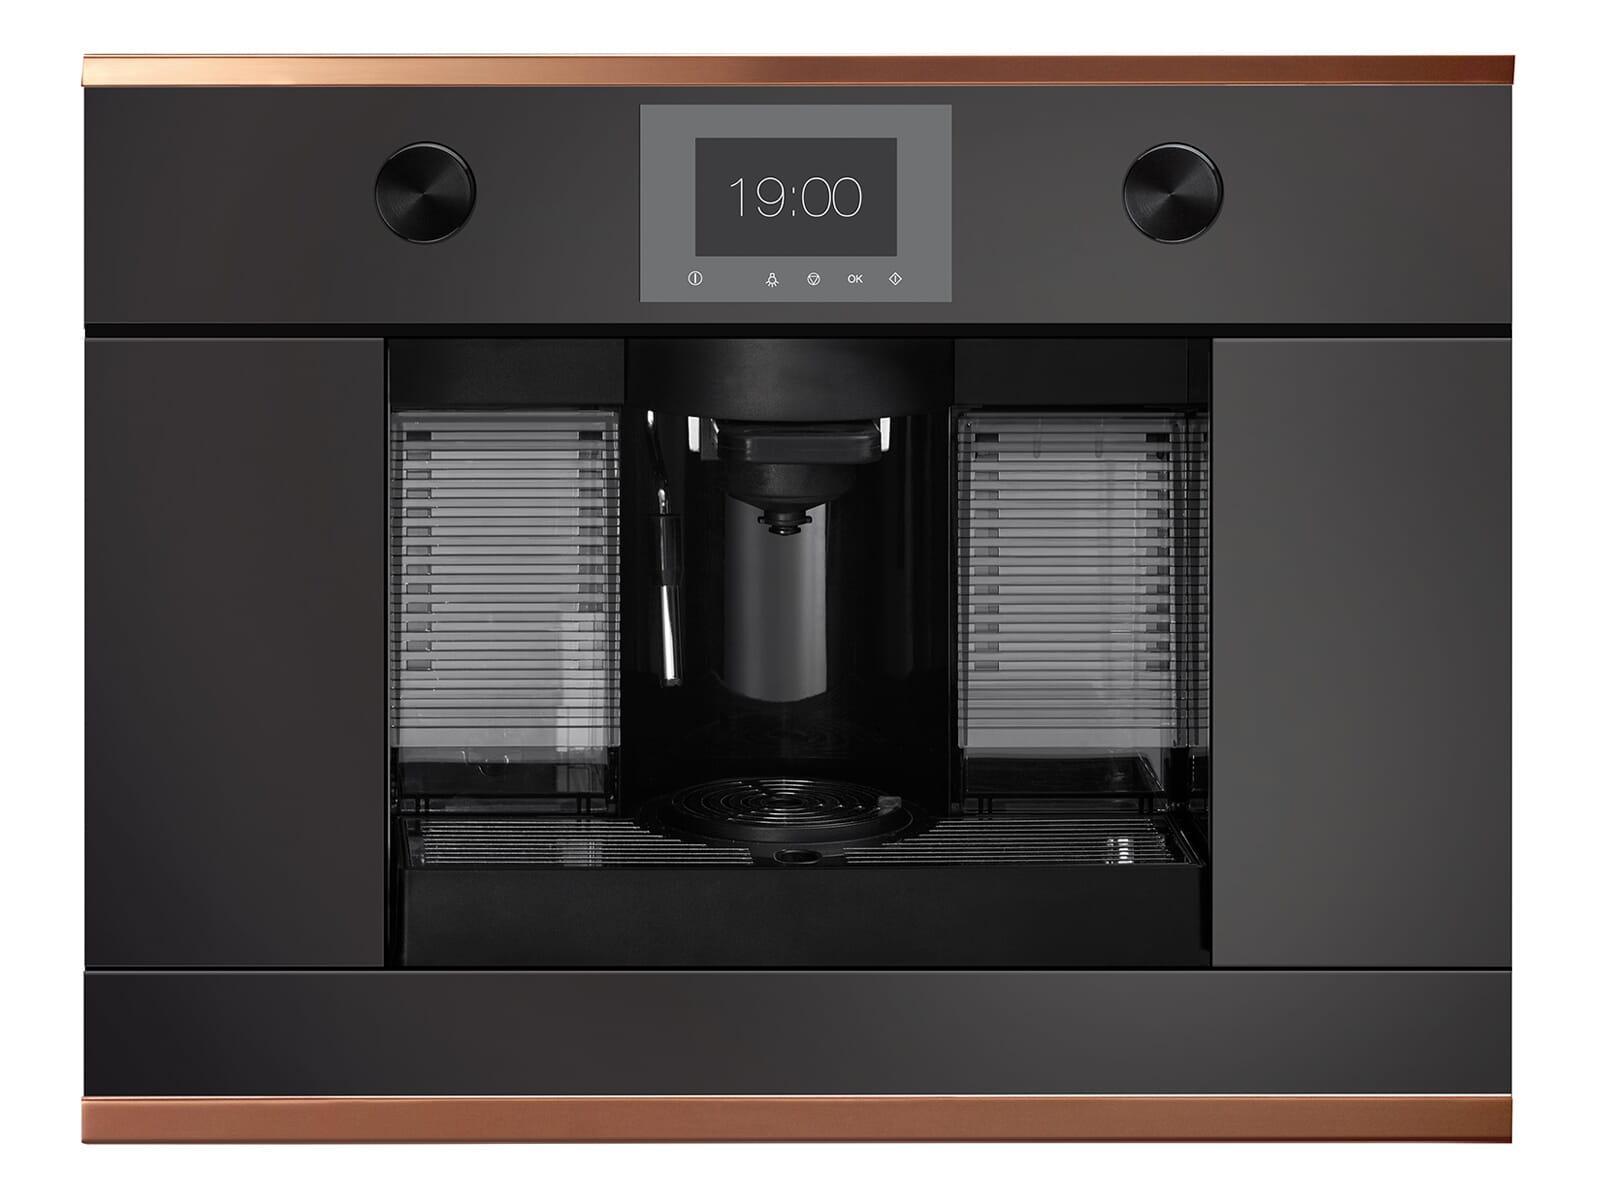 Küppersbusch CKK 6350.0 S7 K-Series.3 Kaffee-Kapselautomat Schwarz/Copper für Nespresso® Kapseln